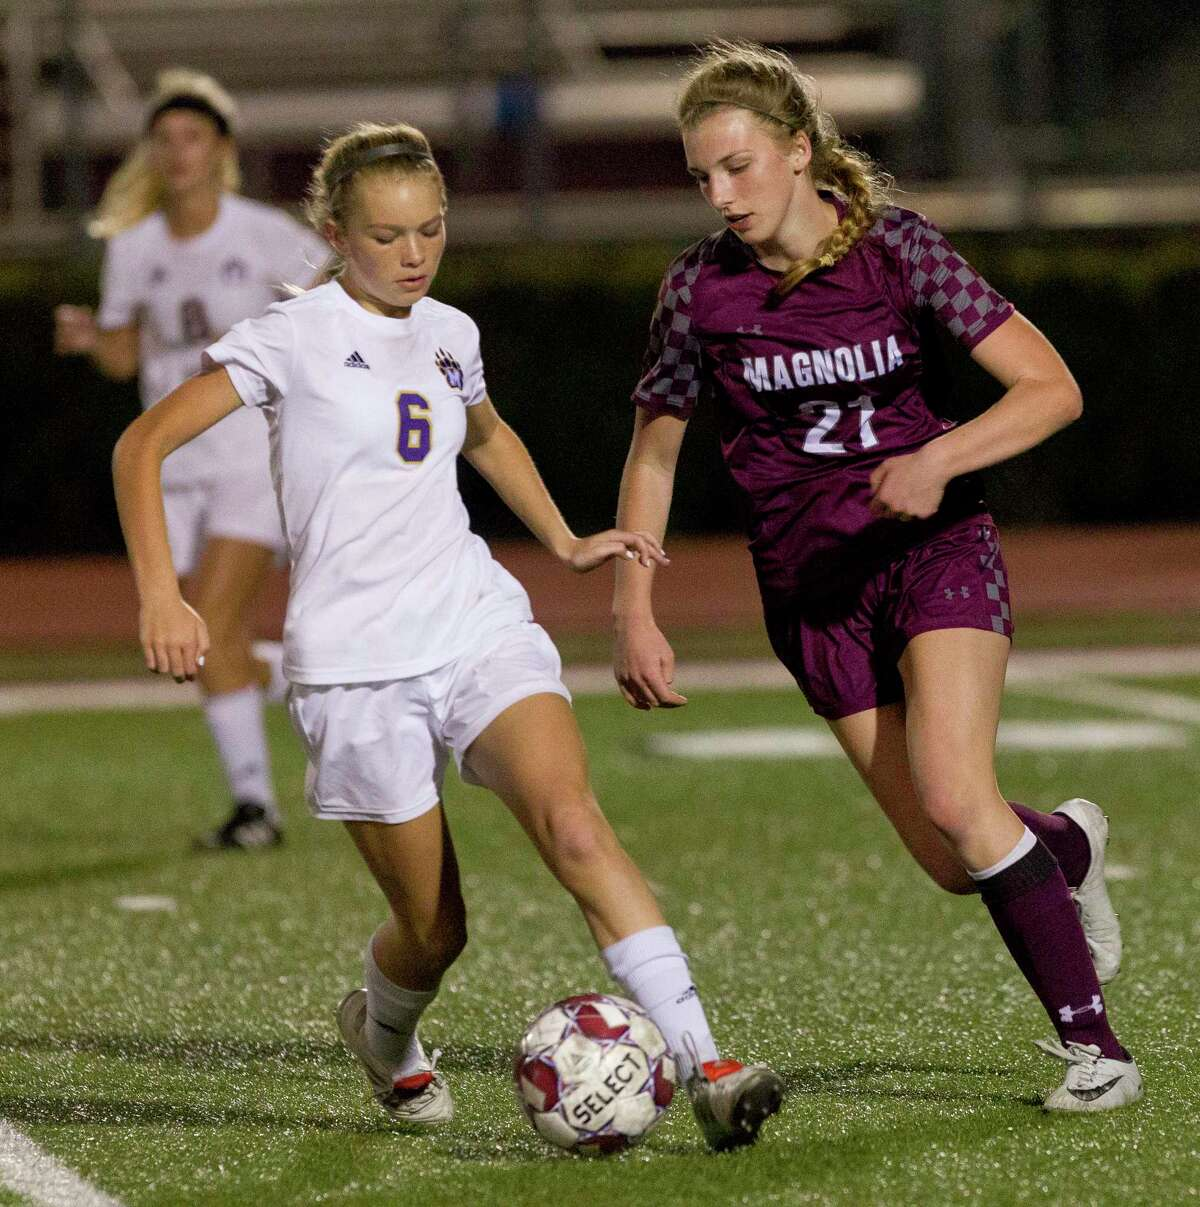 Magnolia defender Katie Clark (21) is one of the key returners this season.